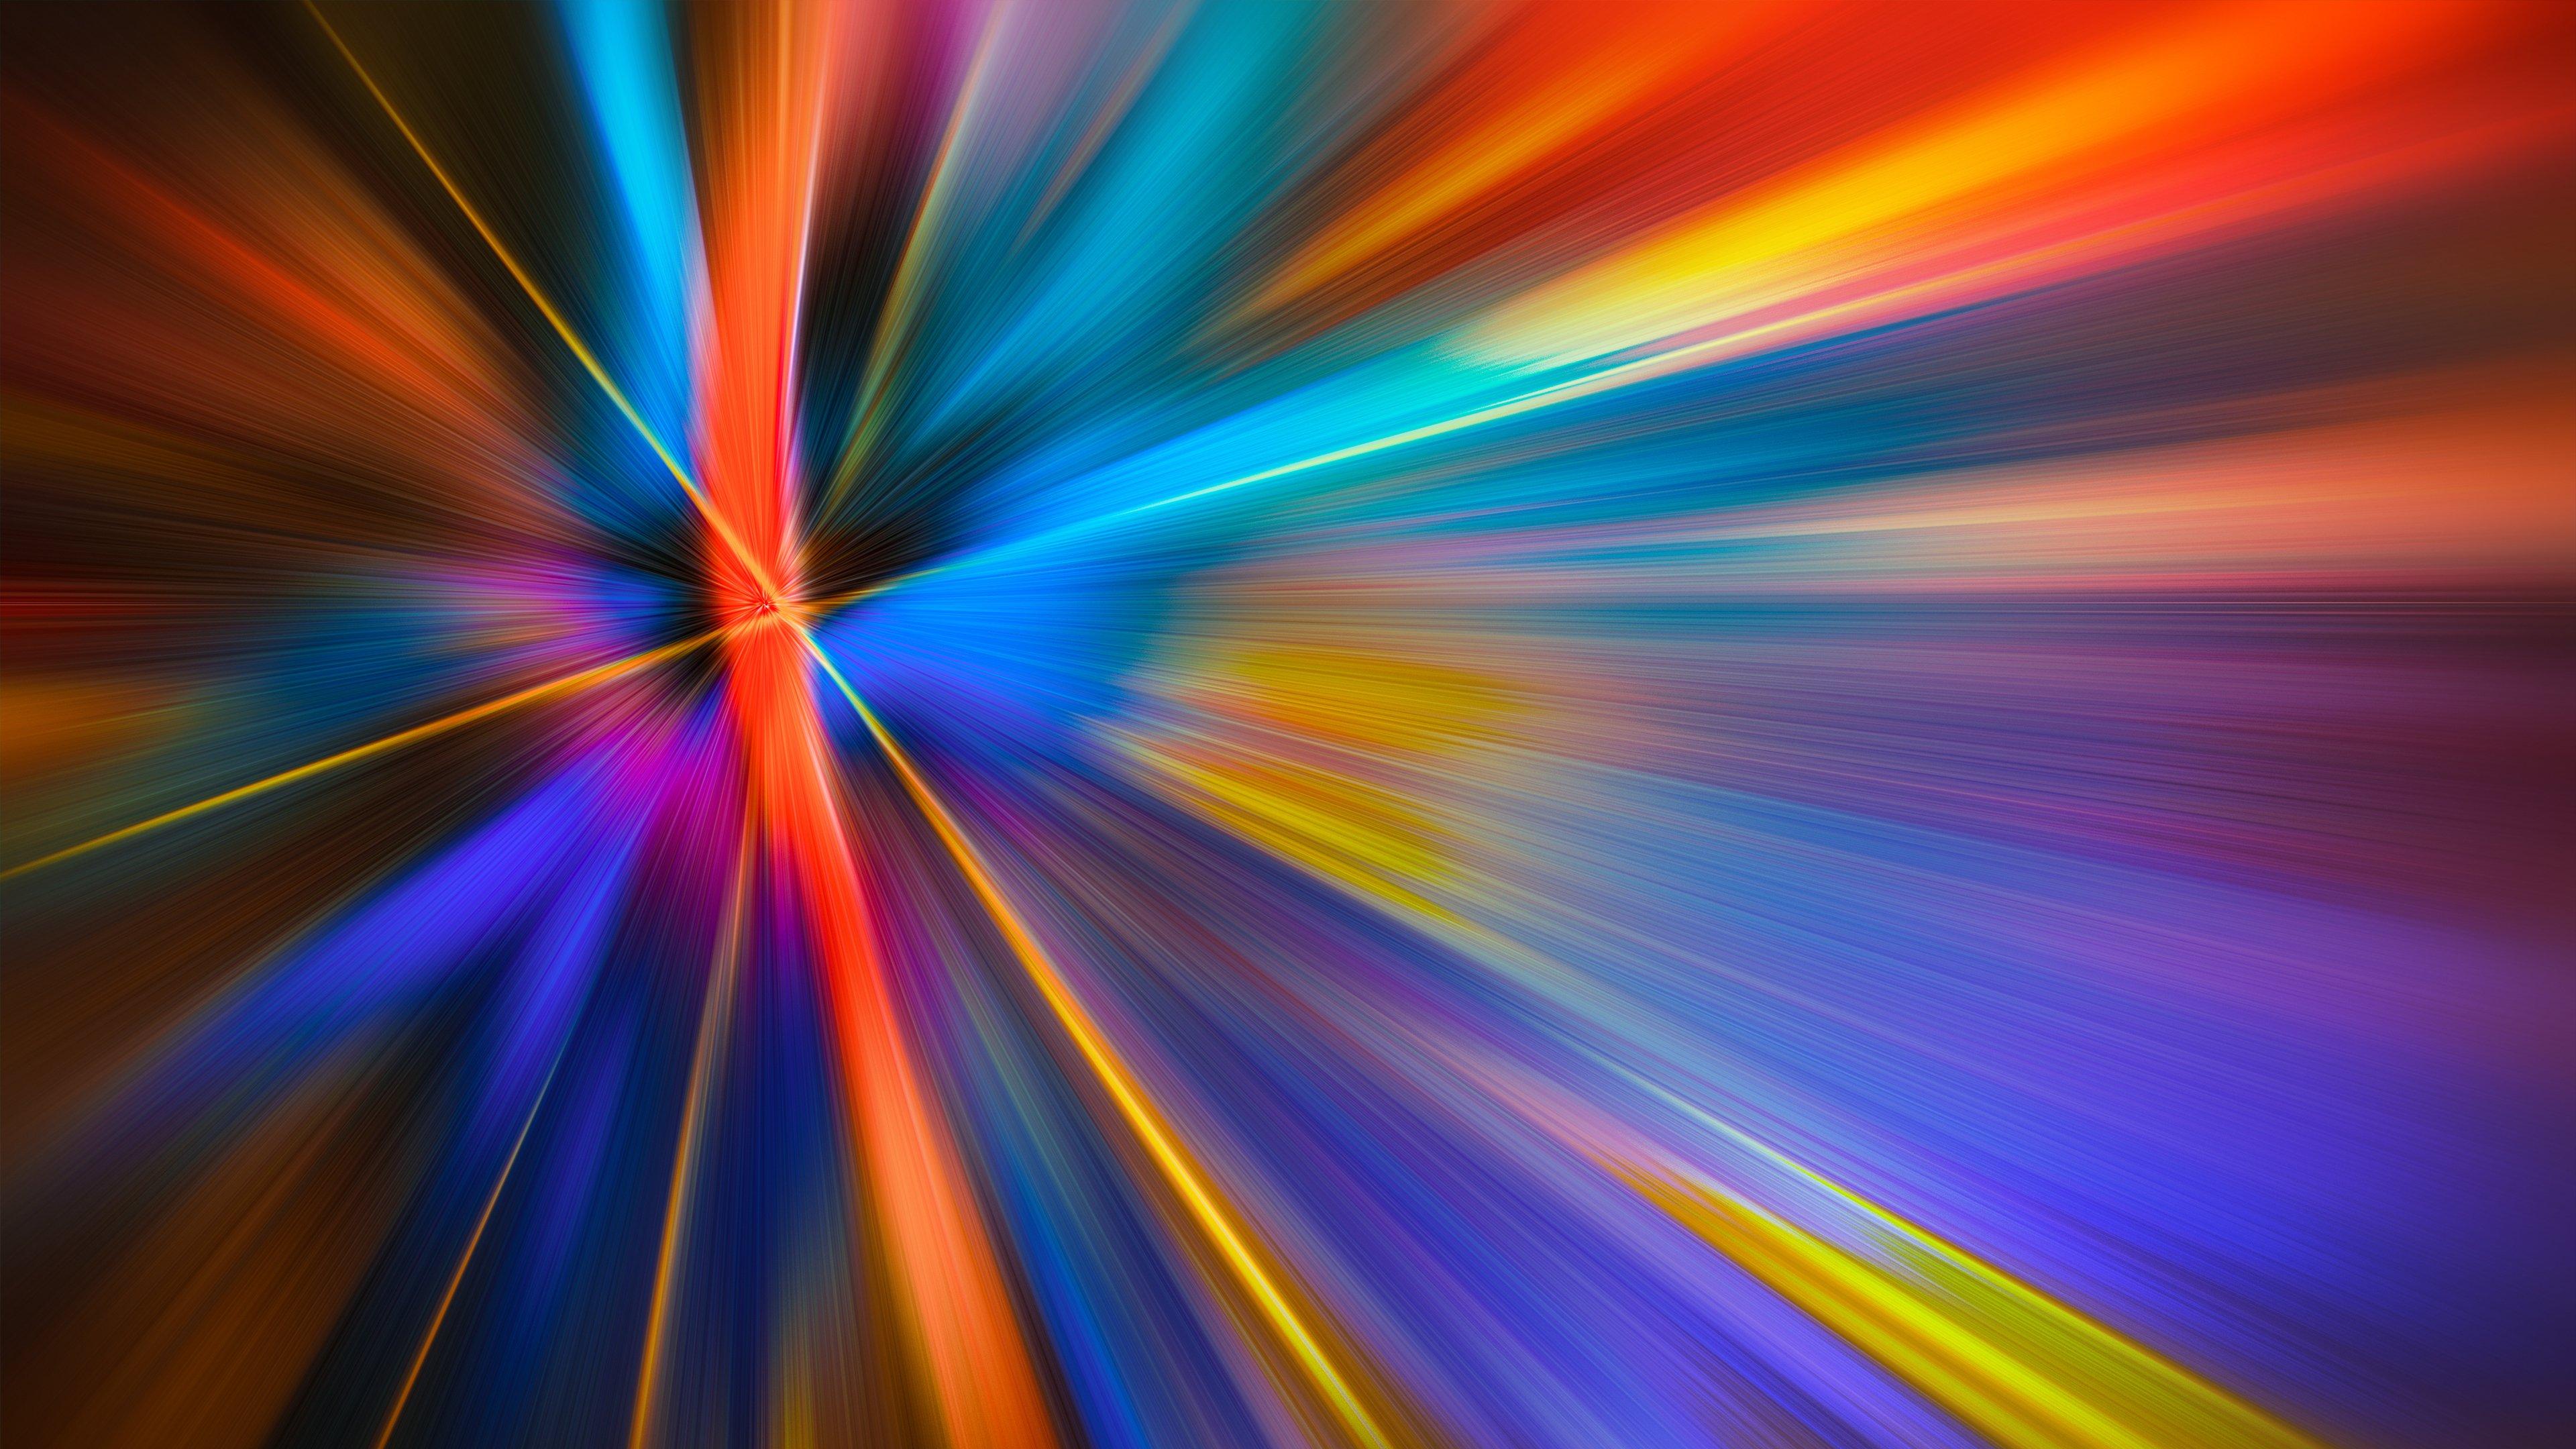 Fondos de pantalla Colores en multiples luces